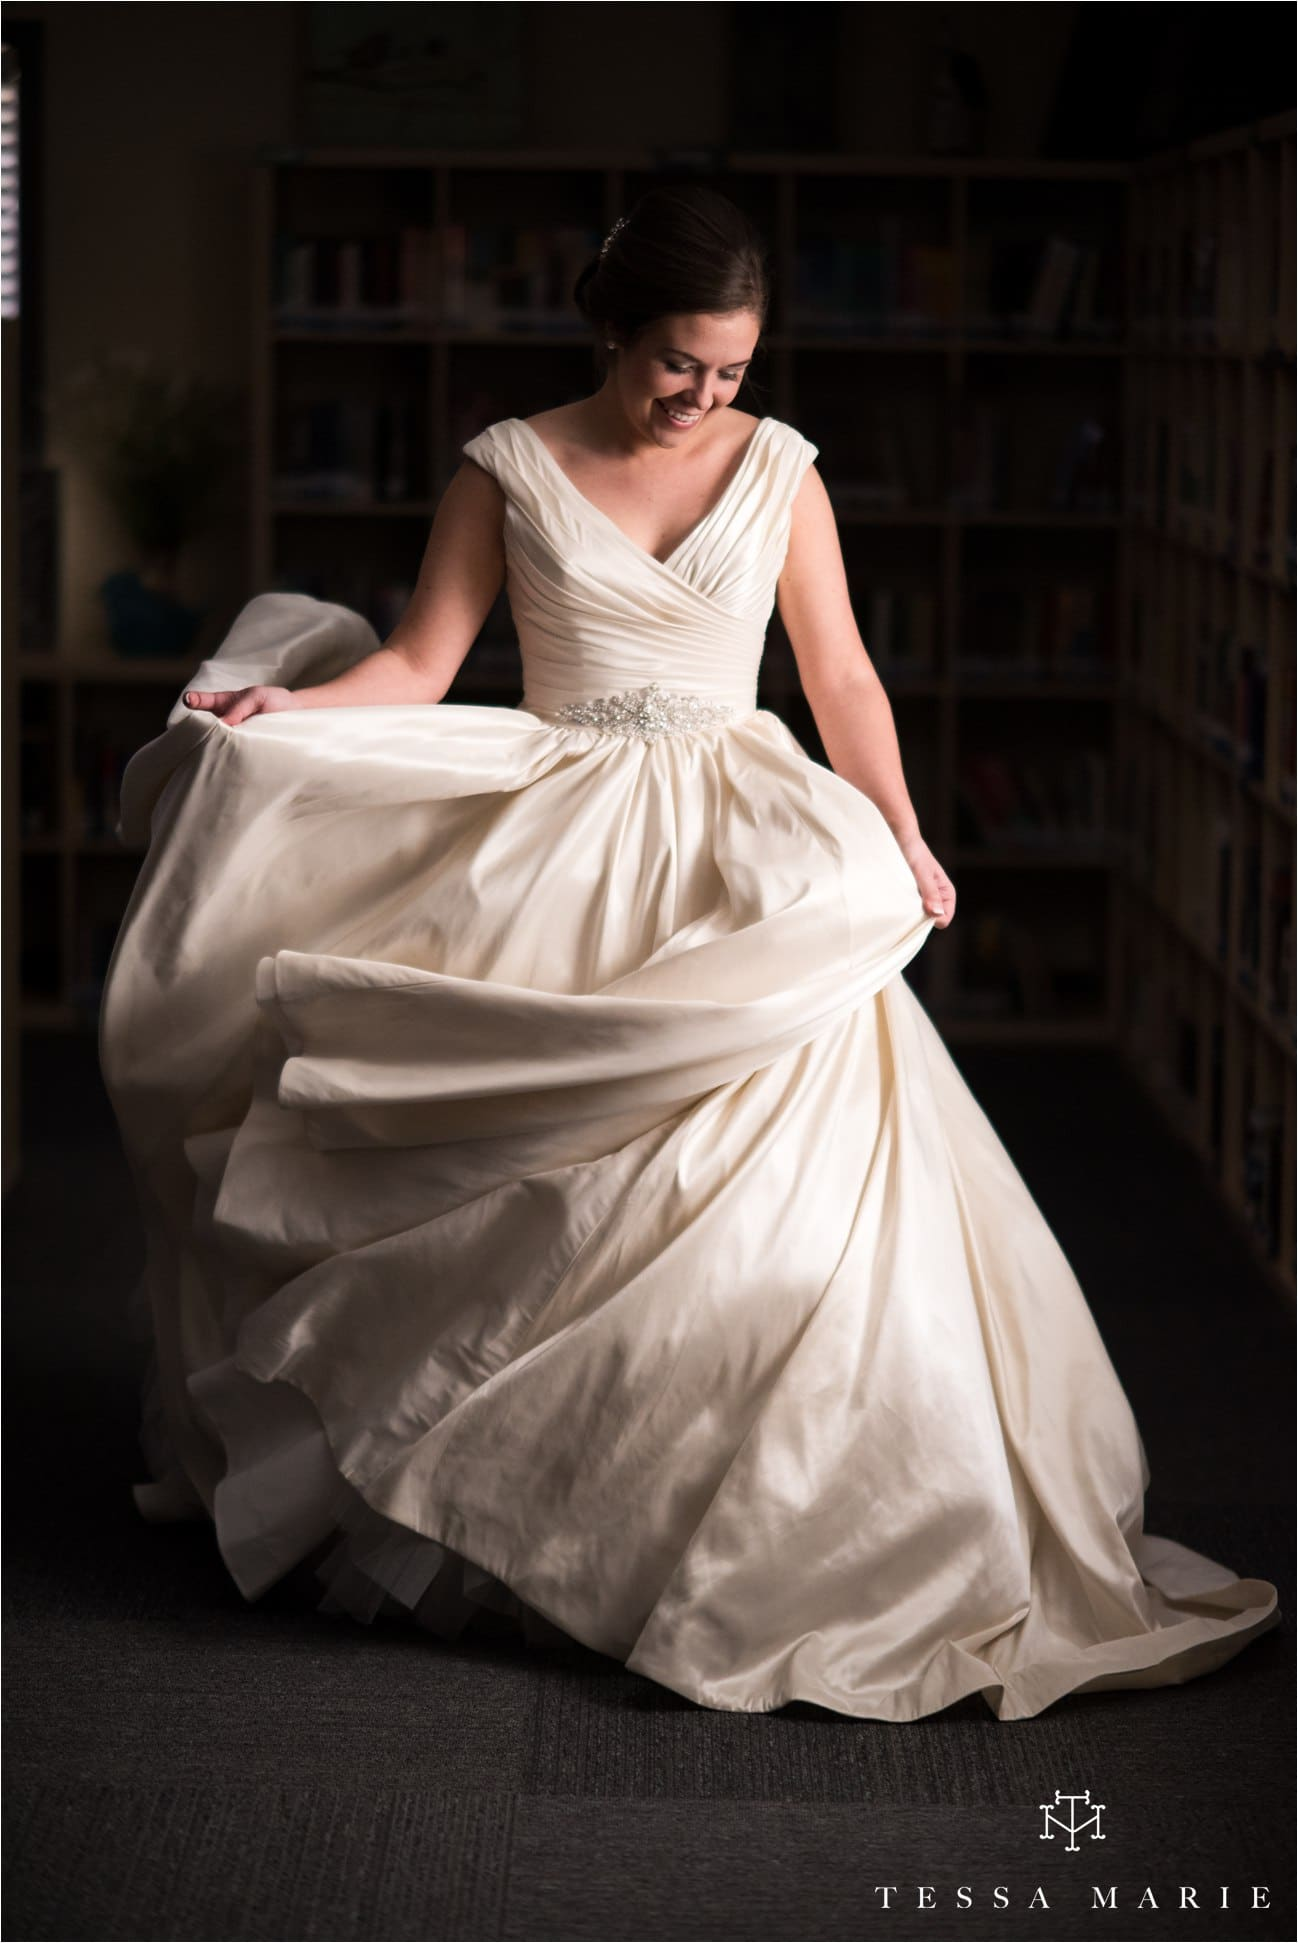 tessa_marie_weddings_wedding_moments_Tessa_marie_studios_0016